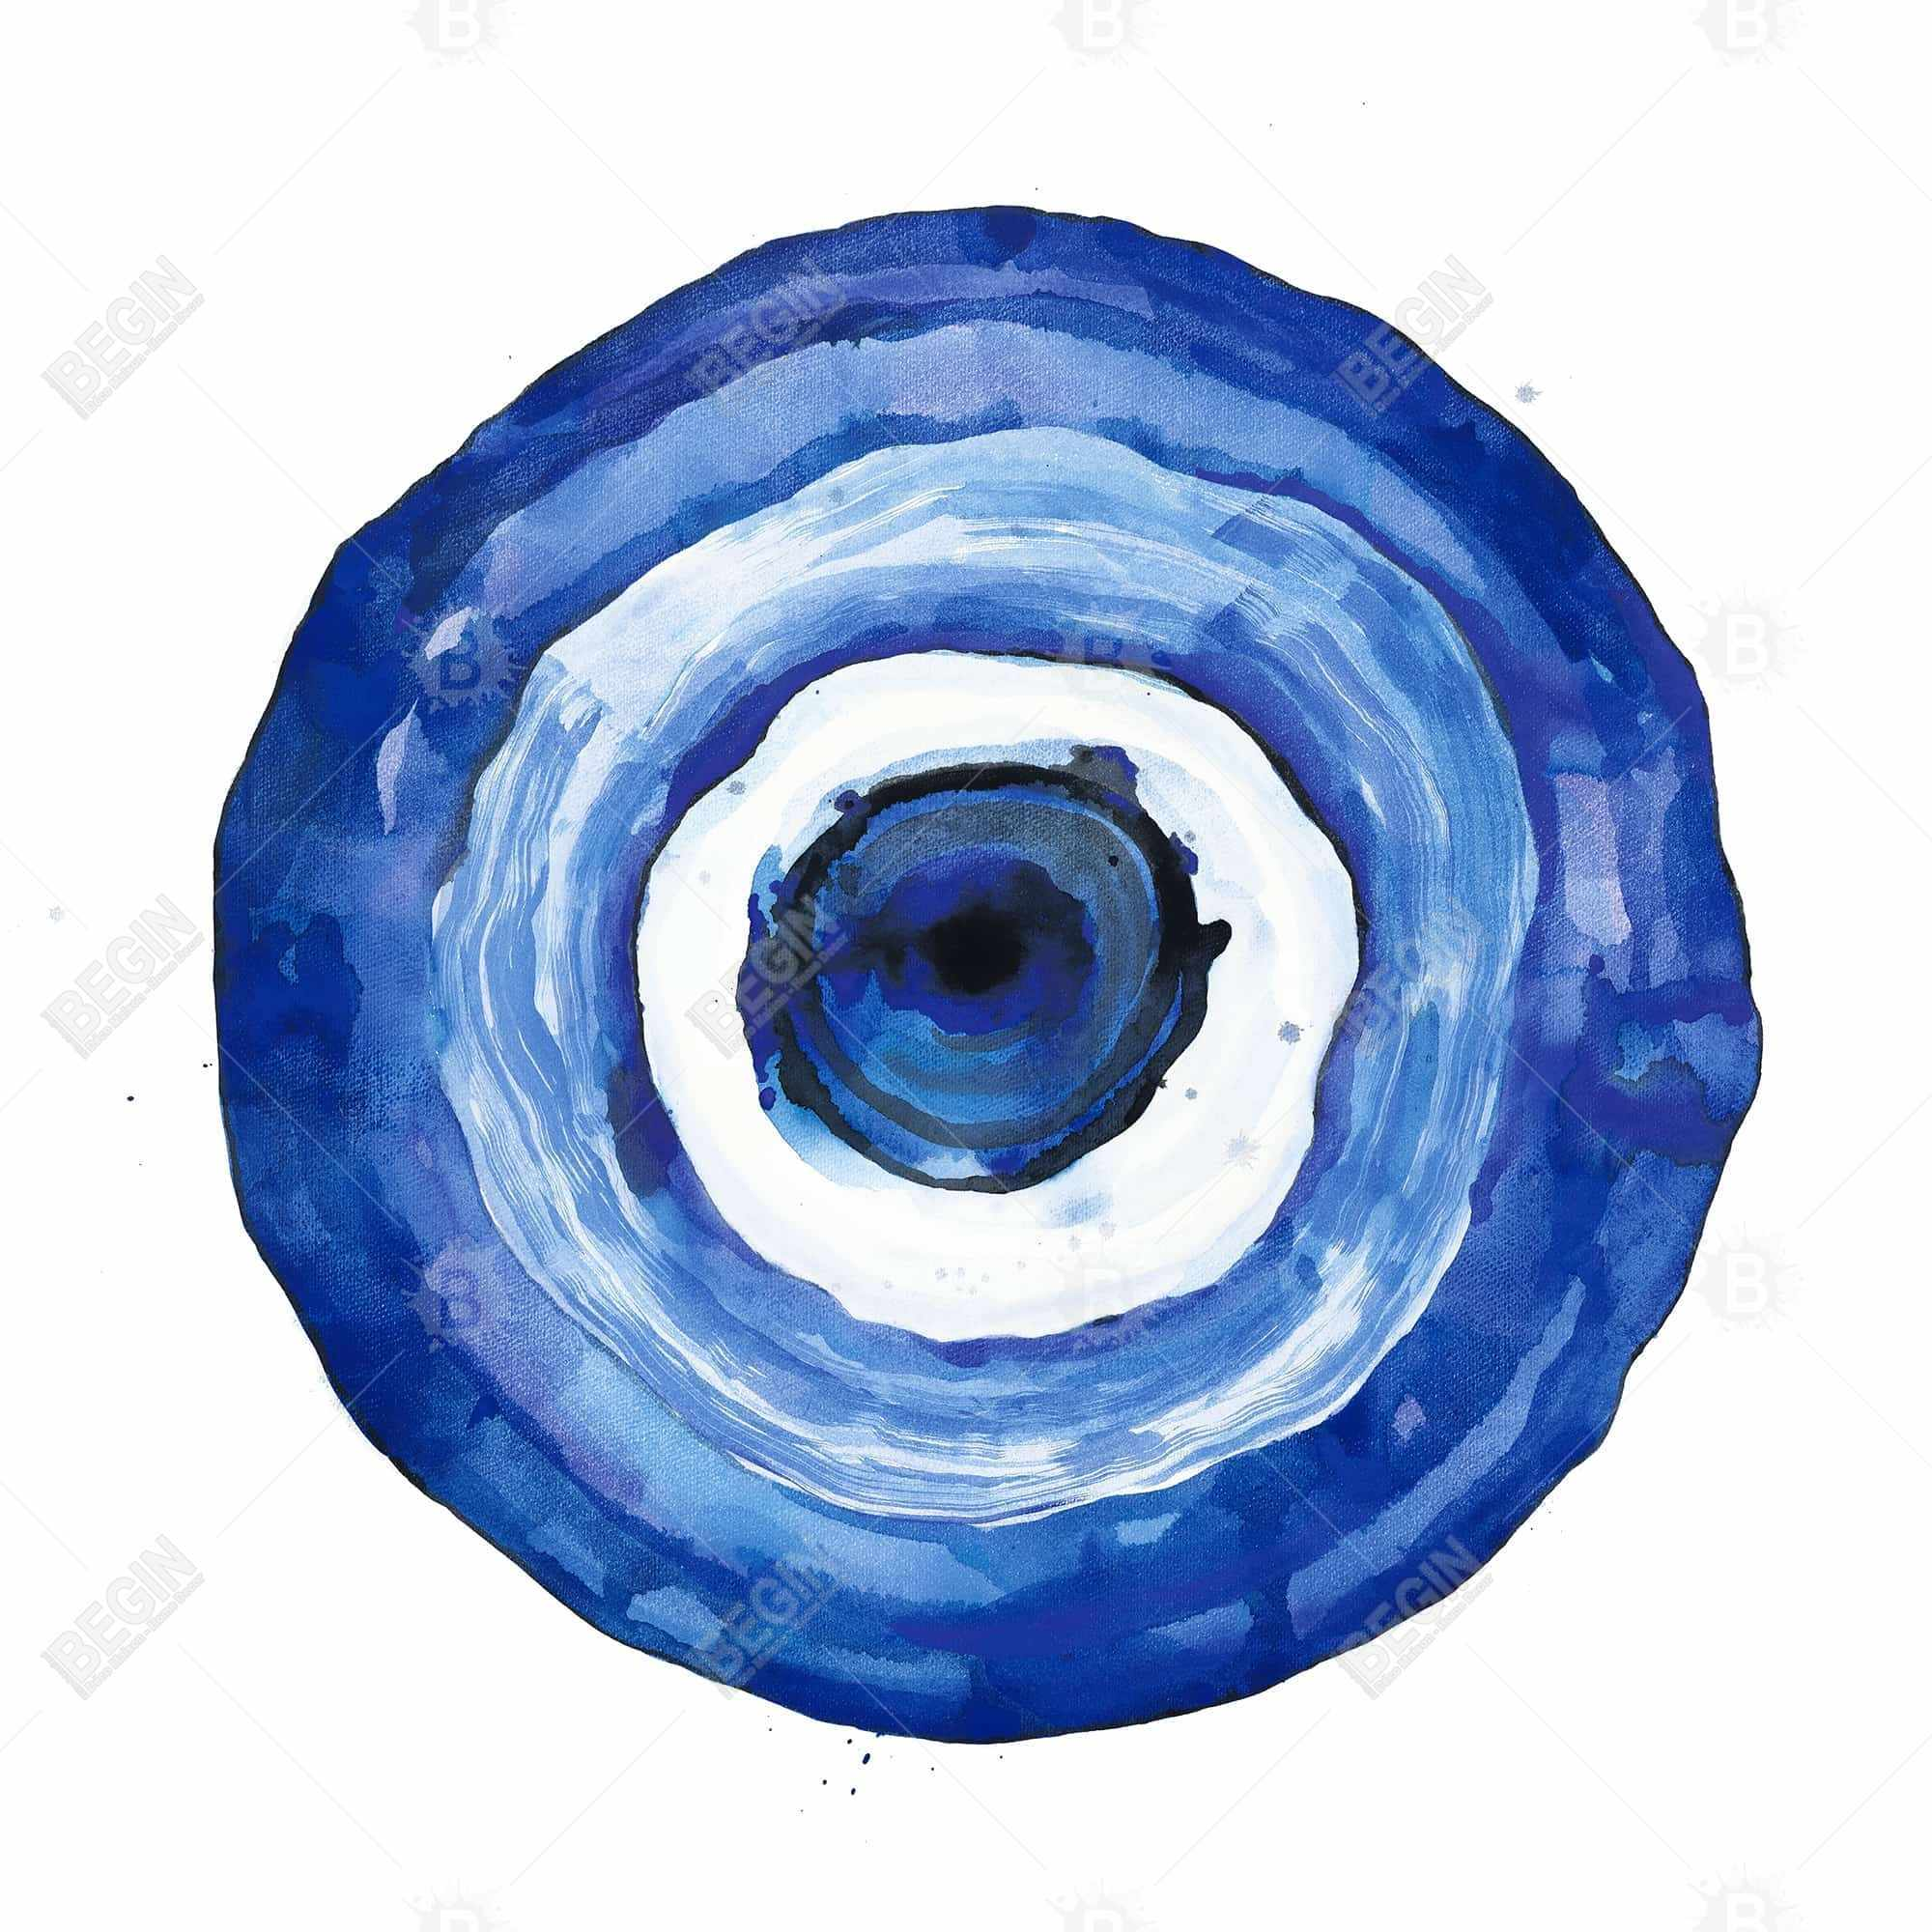 Erbulus blue evil eye